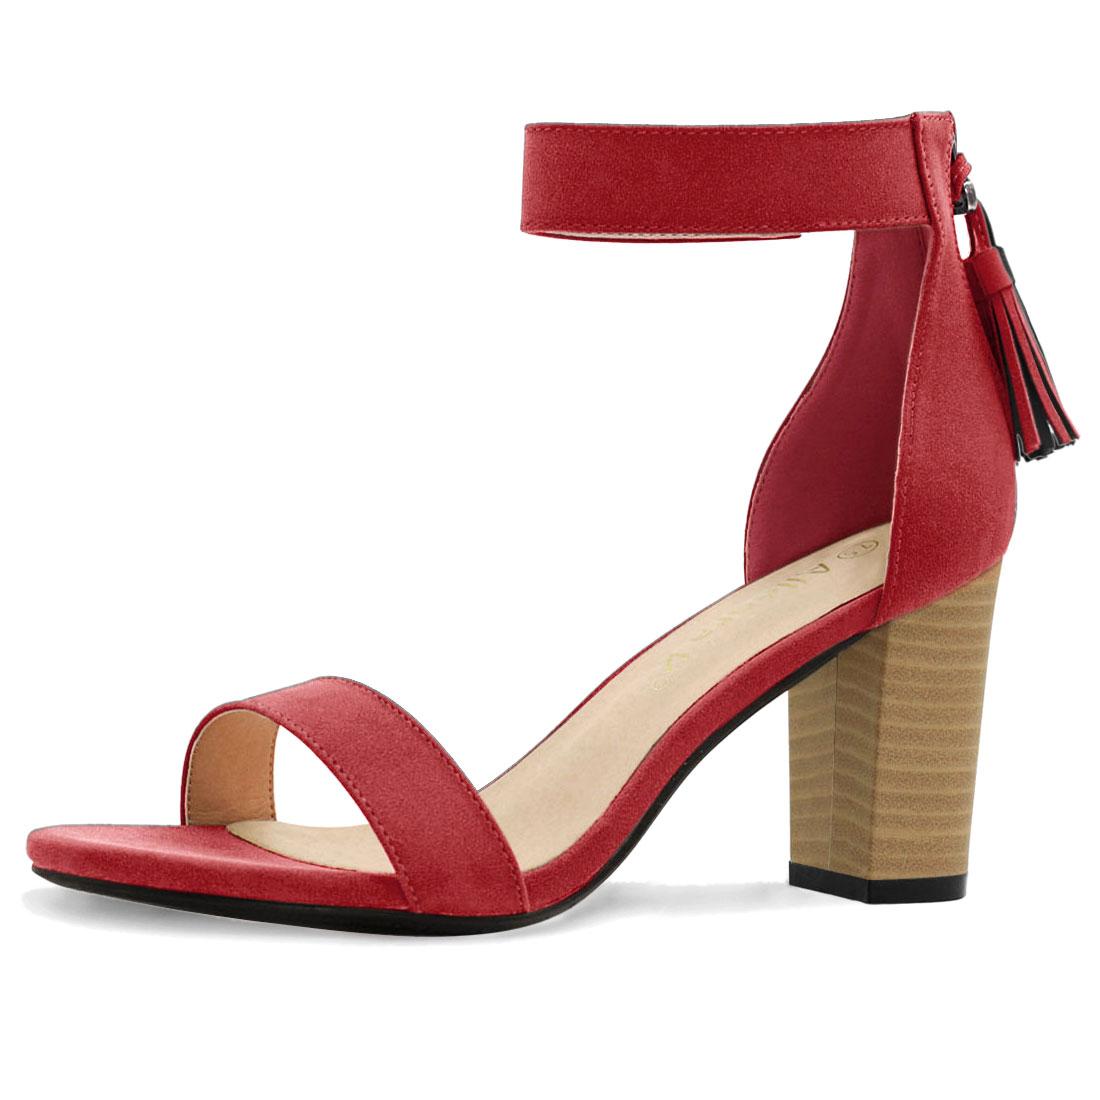 Women Open Toe Tassel Stacked Heel Ankle Strap Sandals Red US 8.5